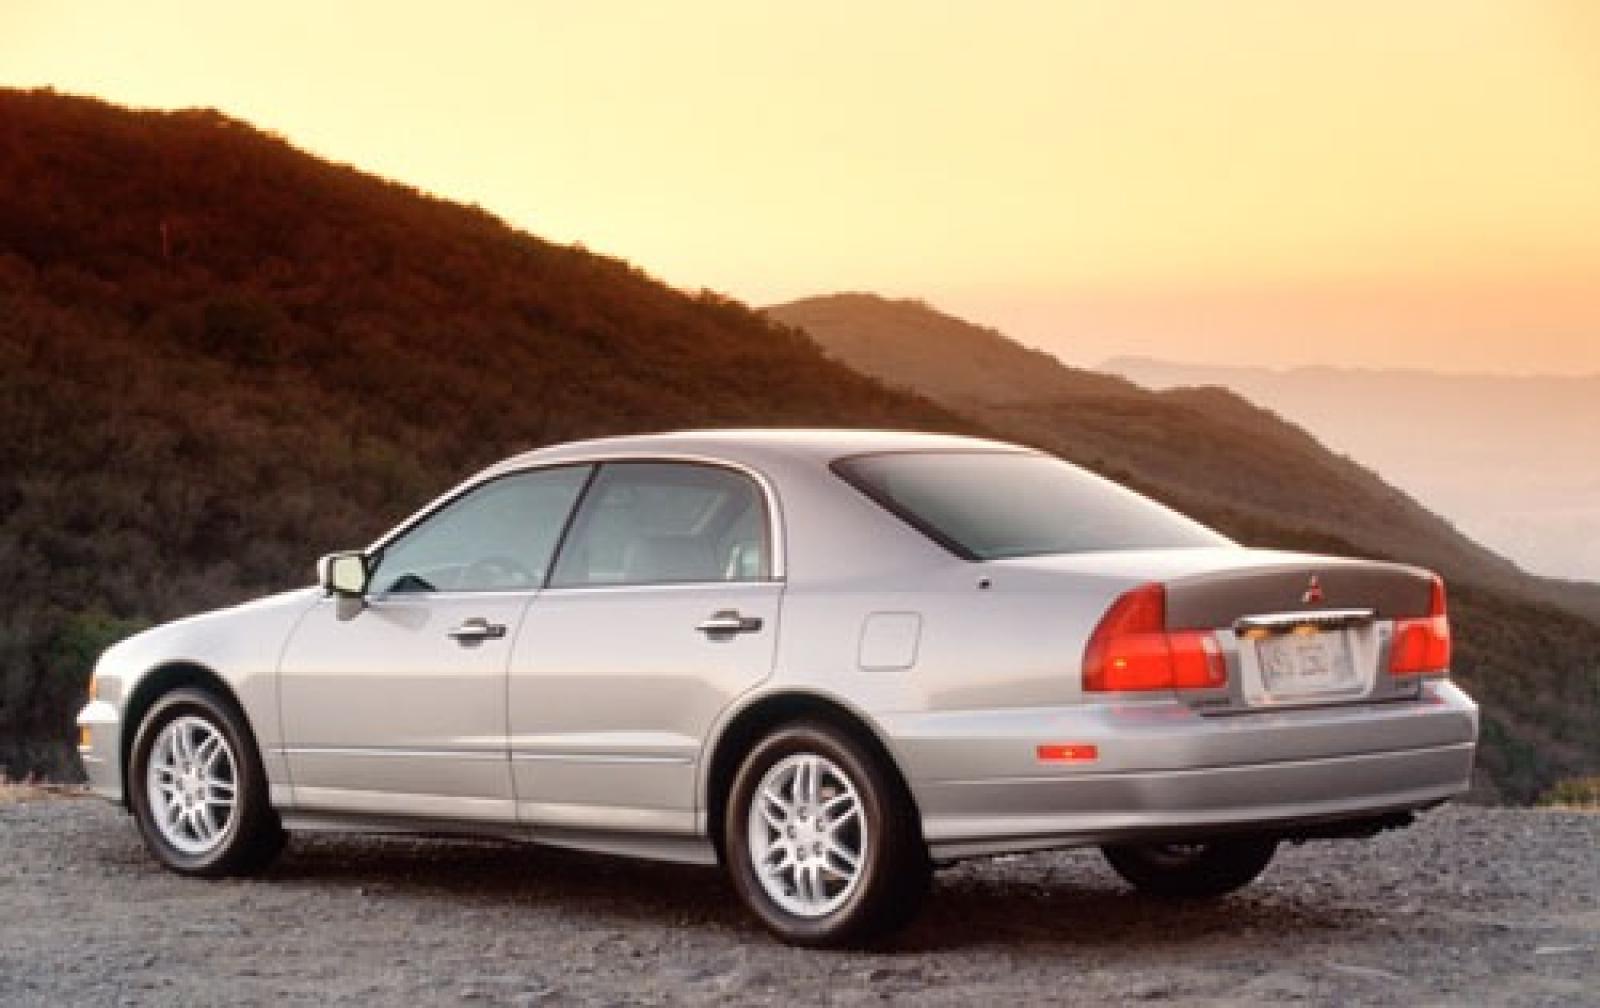 800 1024 1280 1600 origin 2001 Mitsubishi Diamante ...